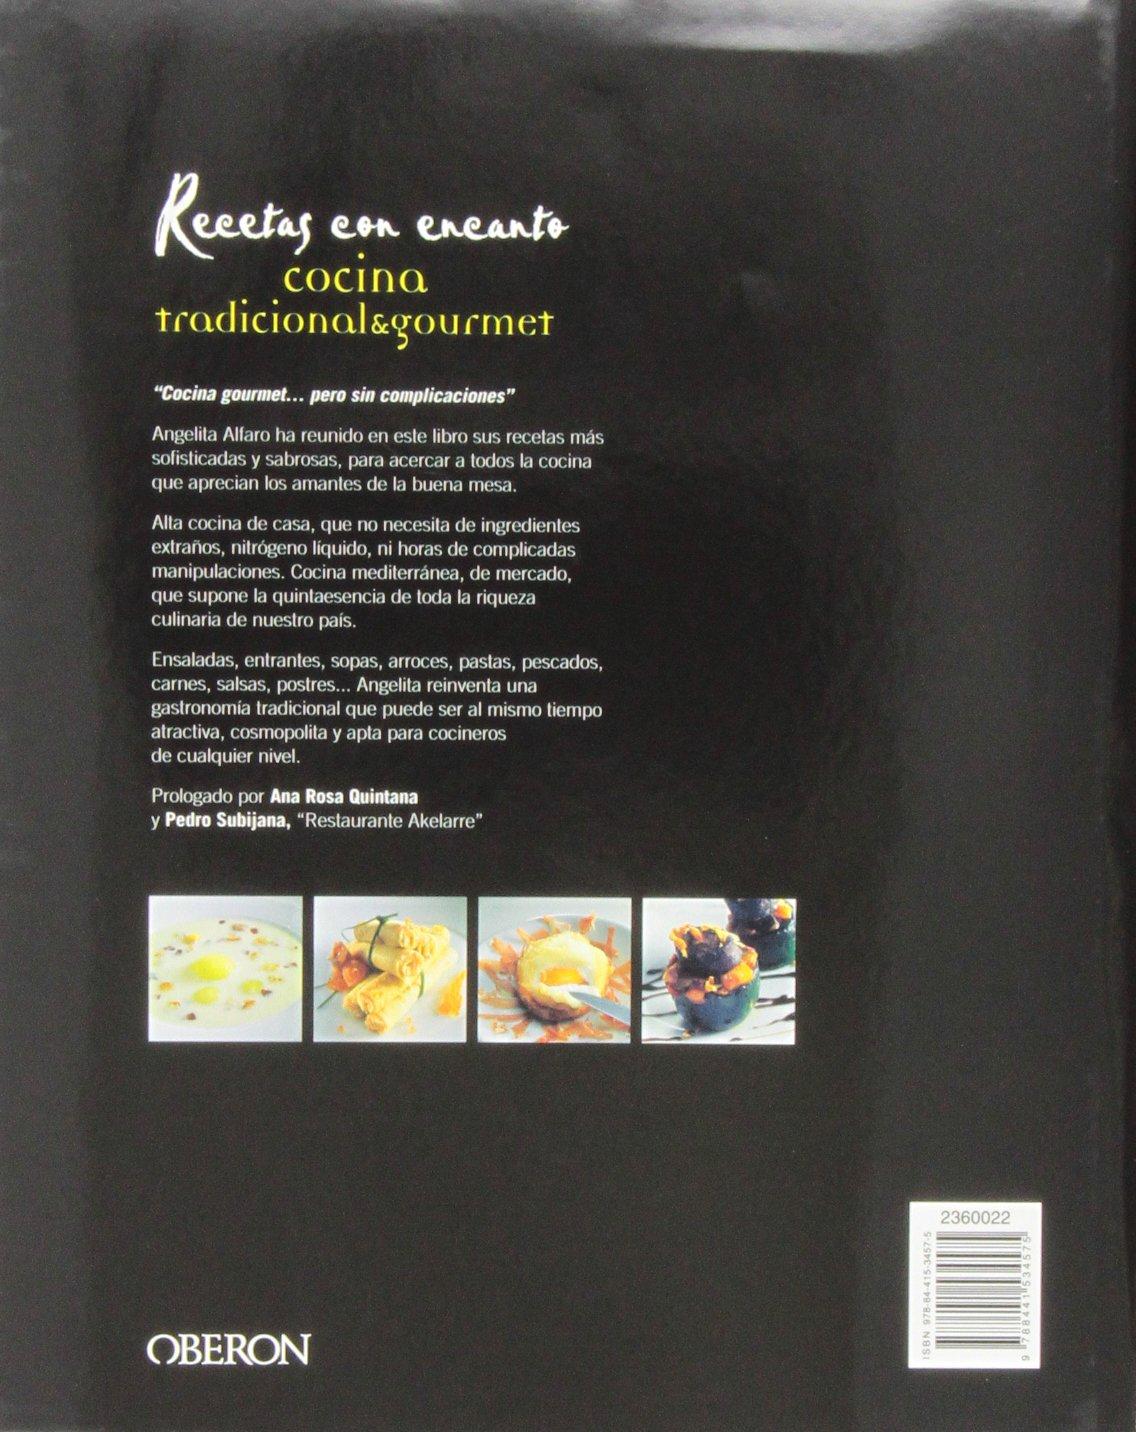 Recetas con encanto / Charming Recipes: Cocina tradicional & gourmet / Traditional & gourmet cuisine (Spanish Edition): Angelita Alfaro Vidorreta: ...